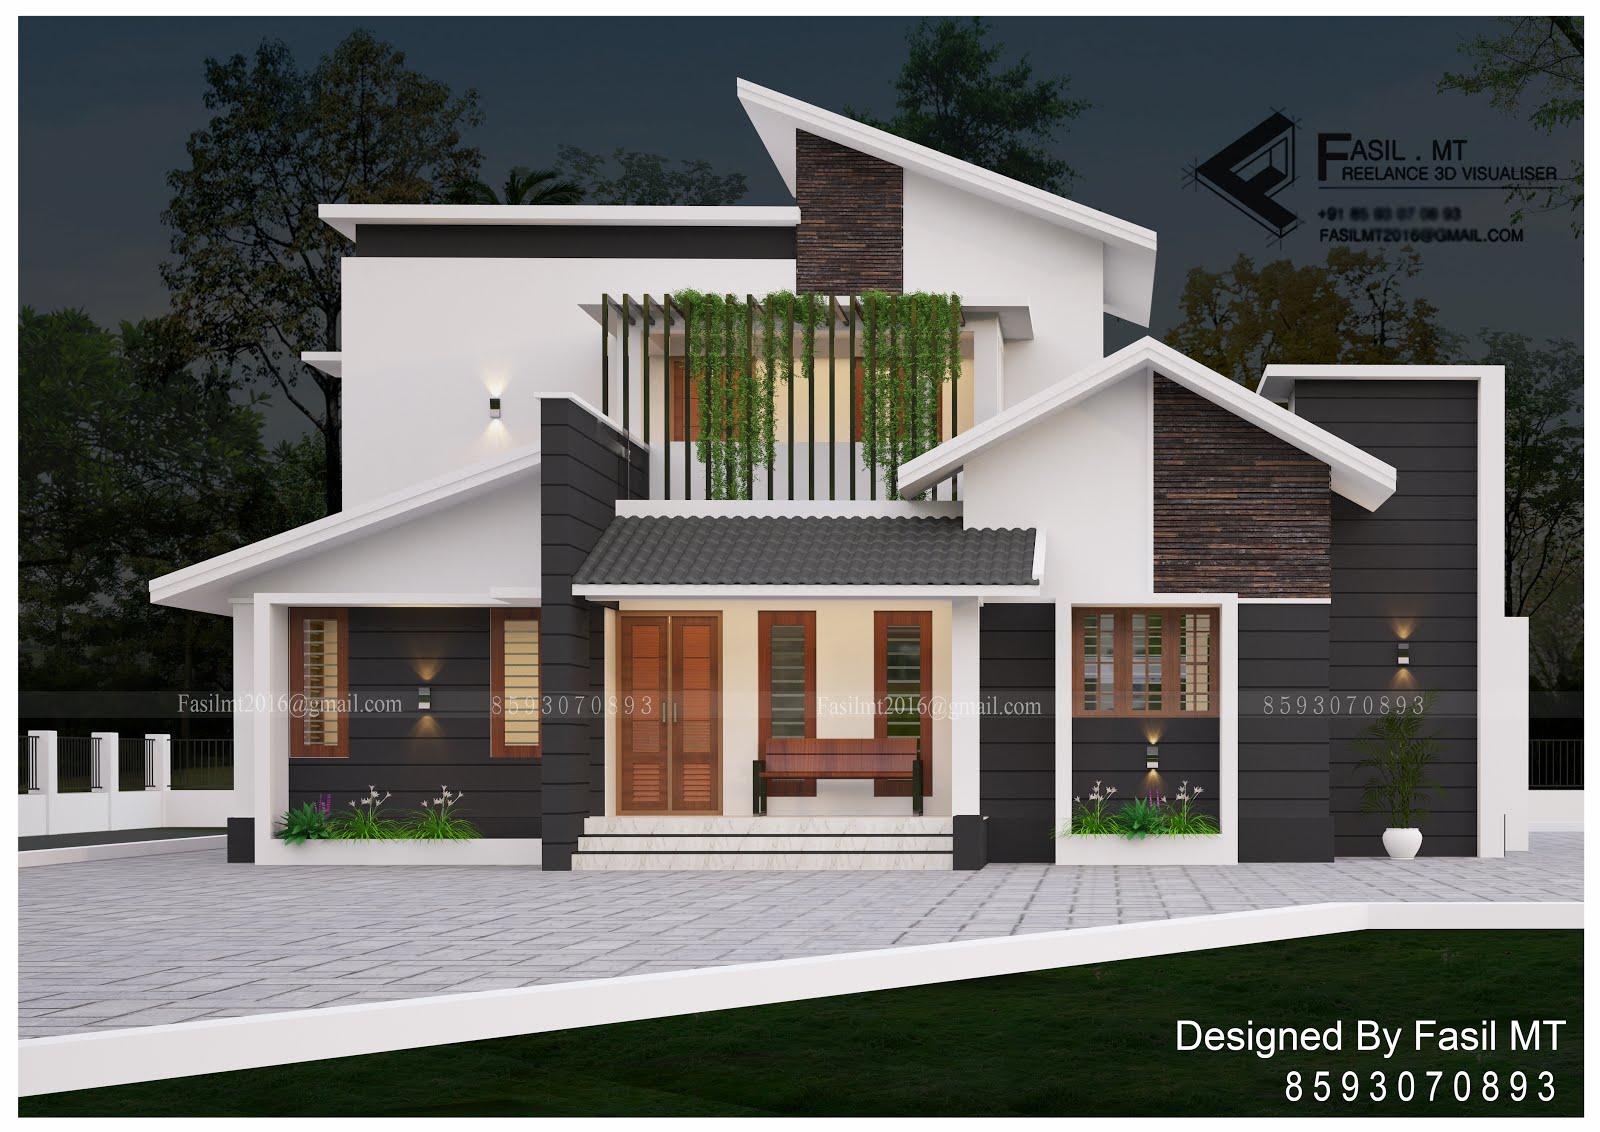 KERALA HOME DESIGNS AND PLANS: 1600 sqft Modern Stylish Home